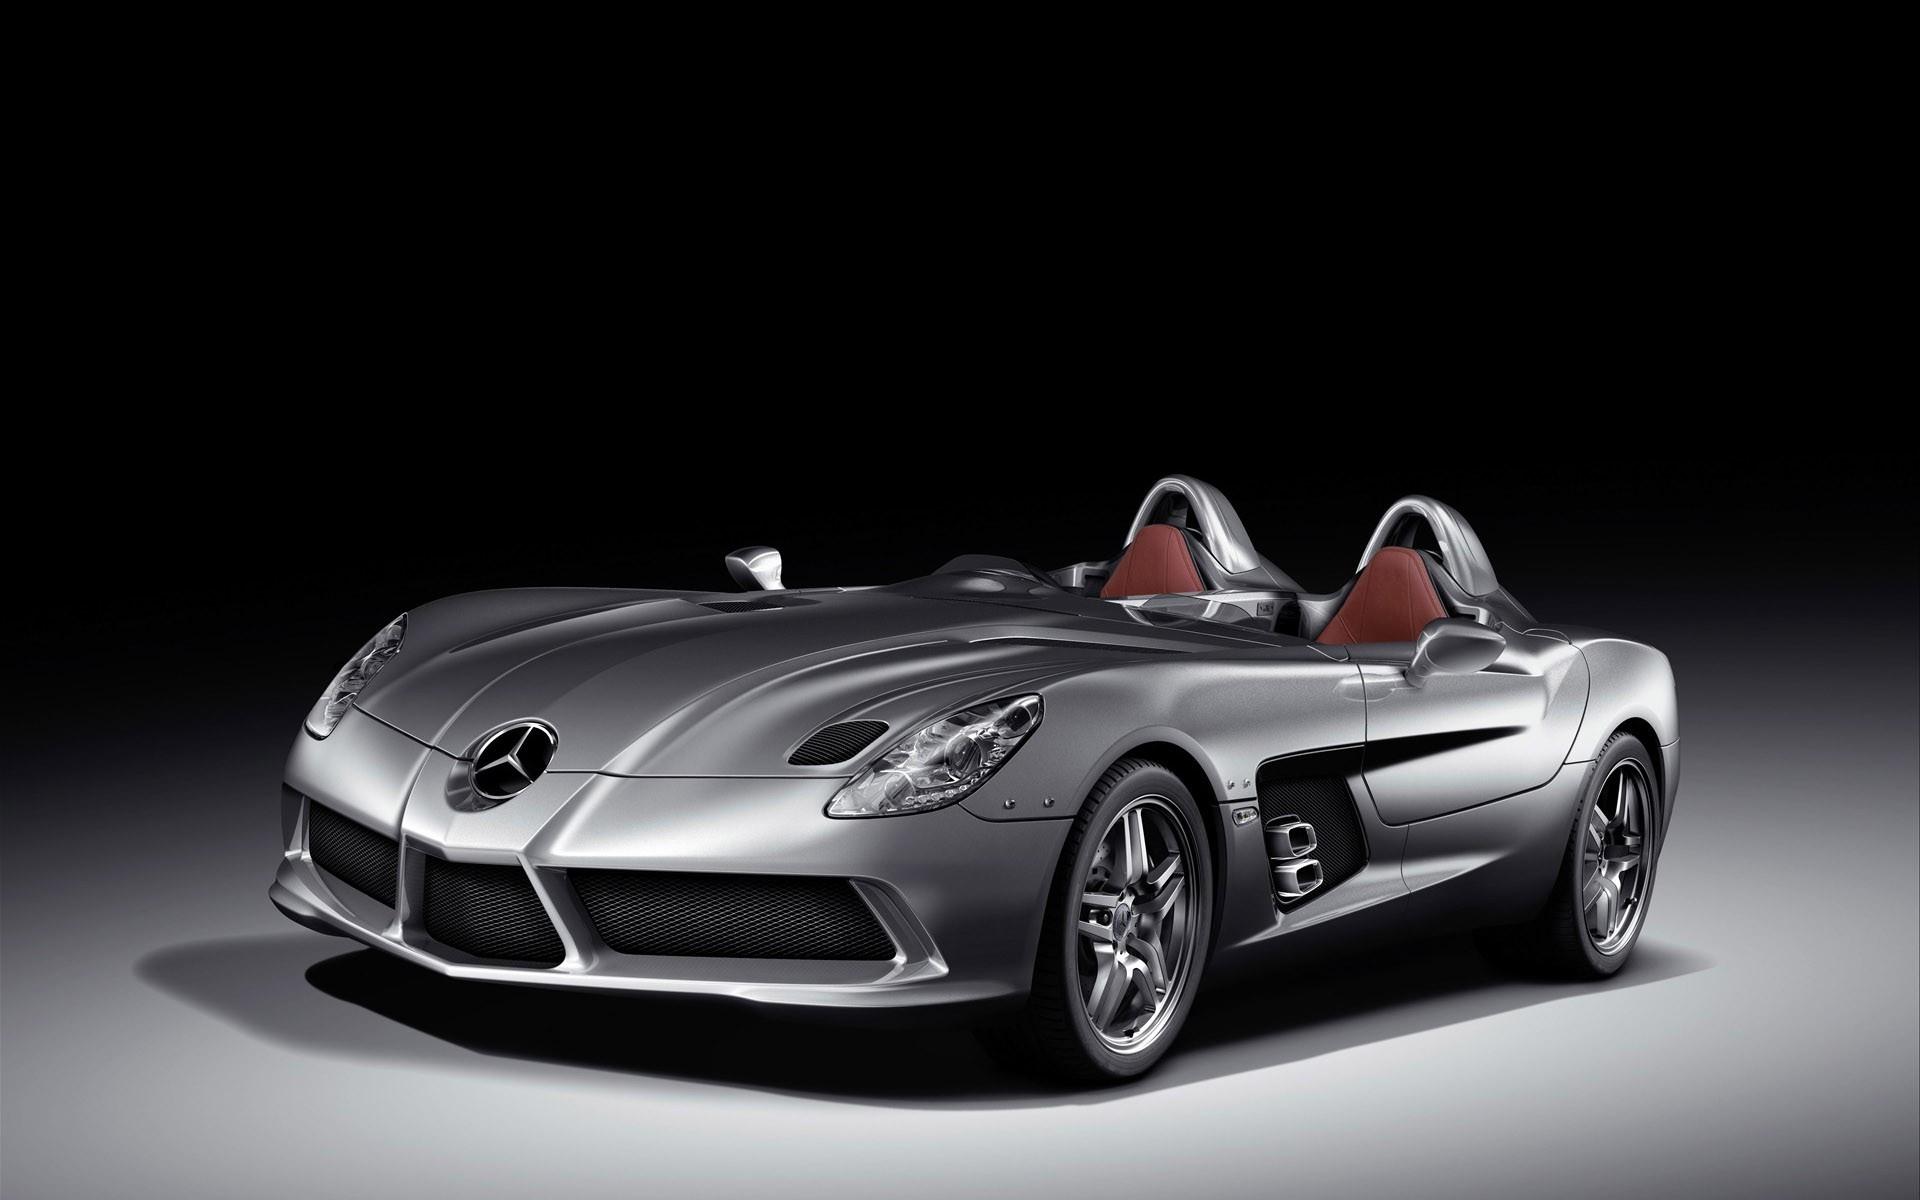 2009 Mercedes Benz SLR McLaren U0027Stirling Mossu0027 Sold For U20ac2,300,000 At  Bonhams Auction   MercedesBlog